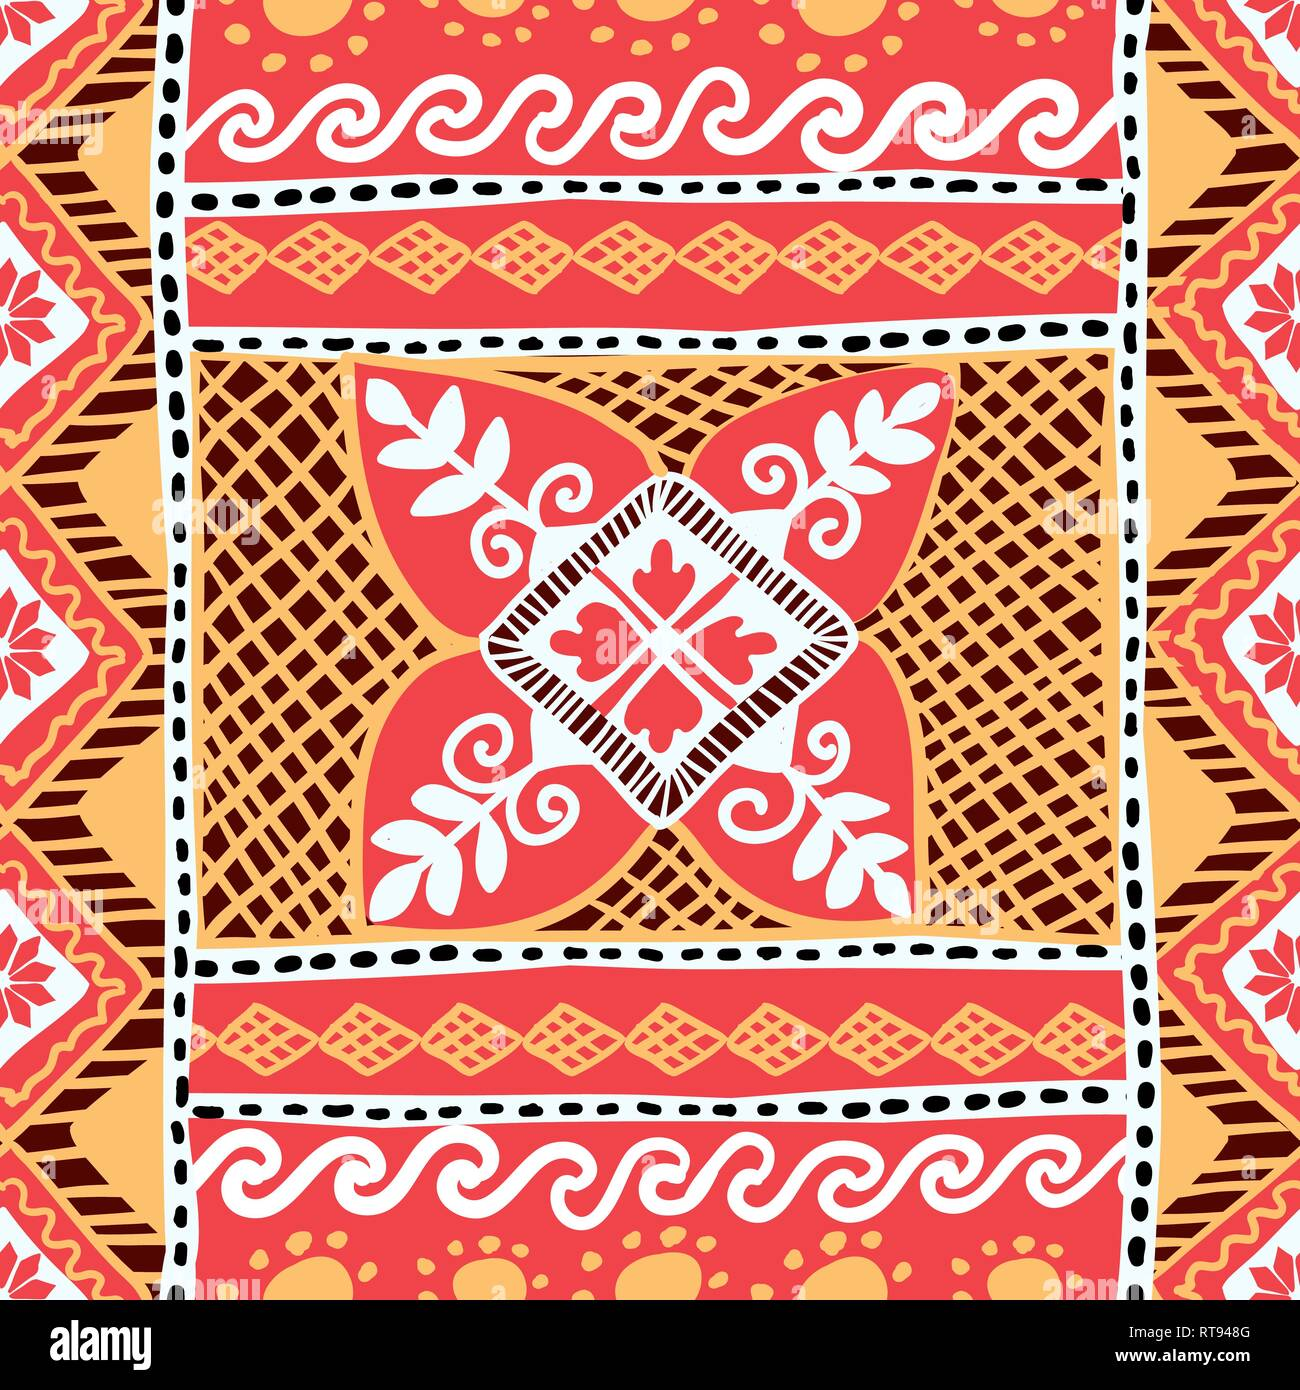 Easter Seamless Pattern with Native Slavonic Ukrainian Pysanka Plant Ornament - Stock Image